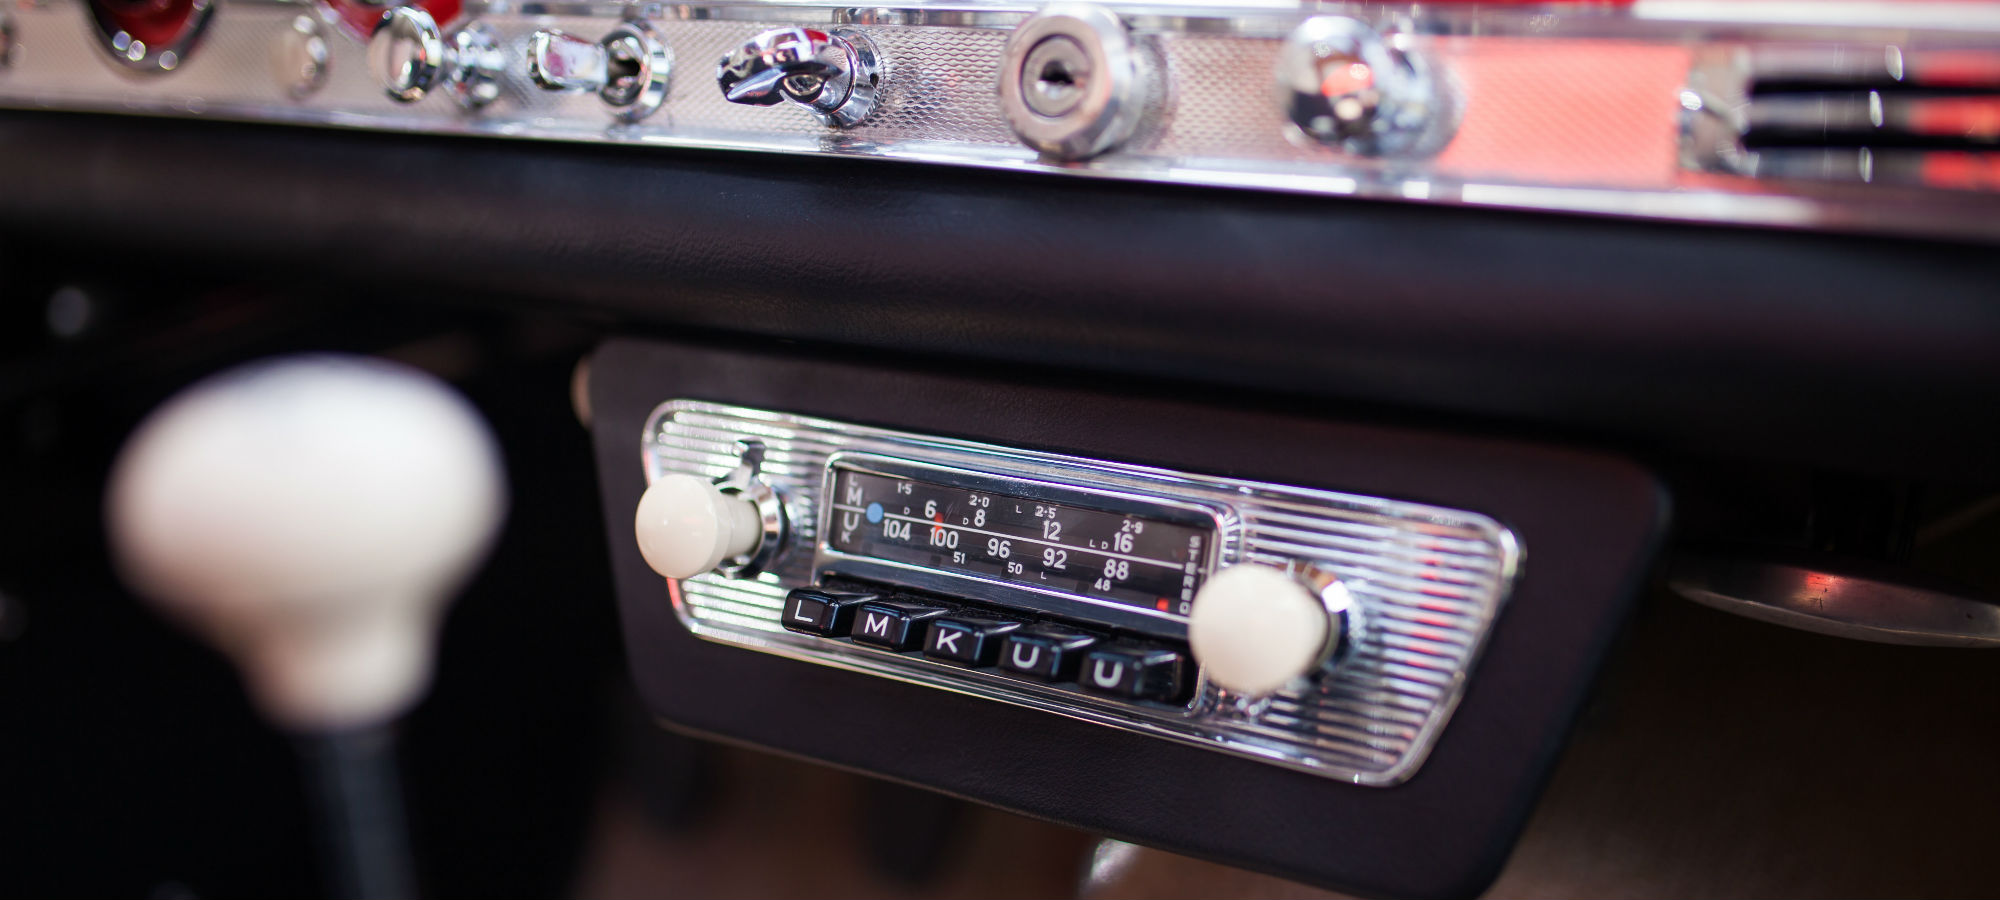 The London Motor Show 1955 Mercedes-Benz 300 SL Coupé 'Gullwing'